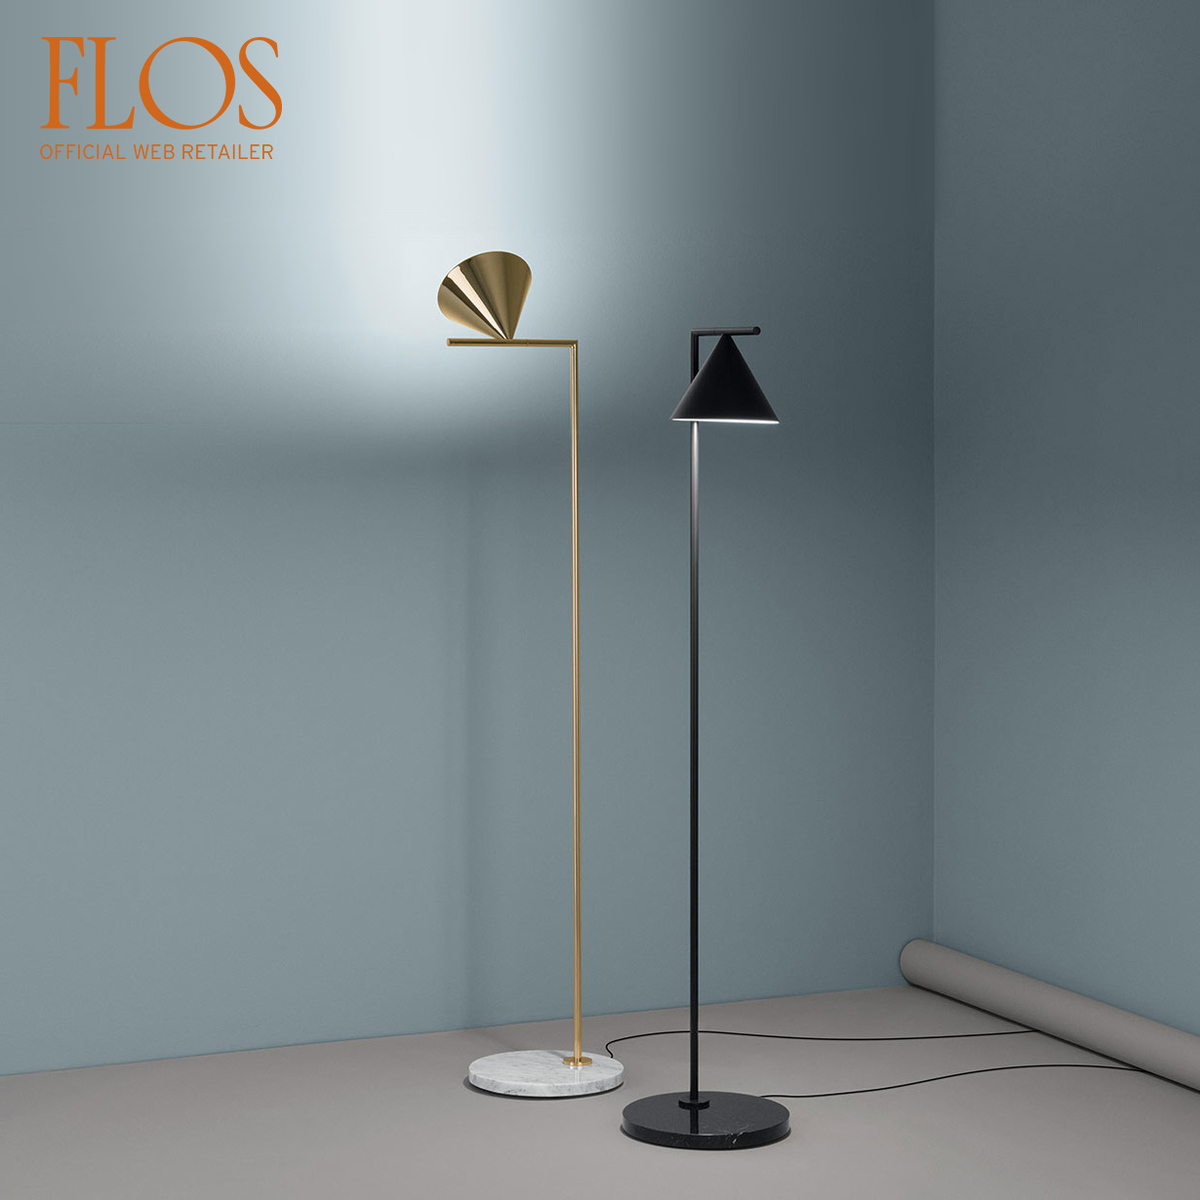 flos lighting nyc. Flos Lighting New York. York A Nyc R